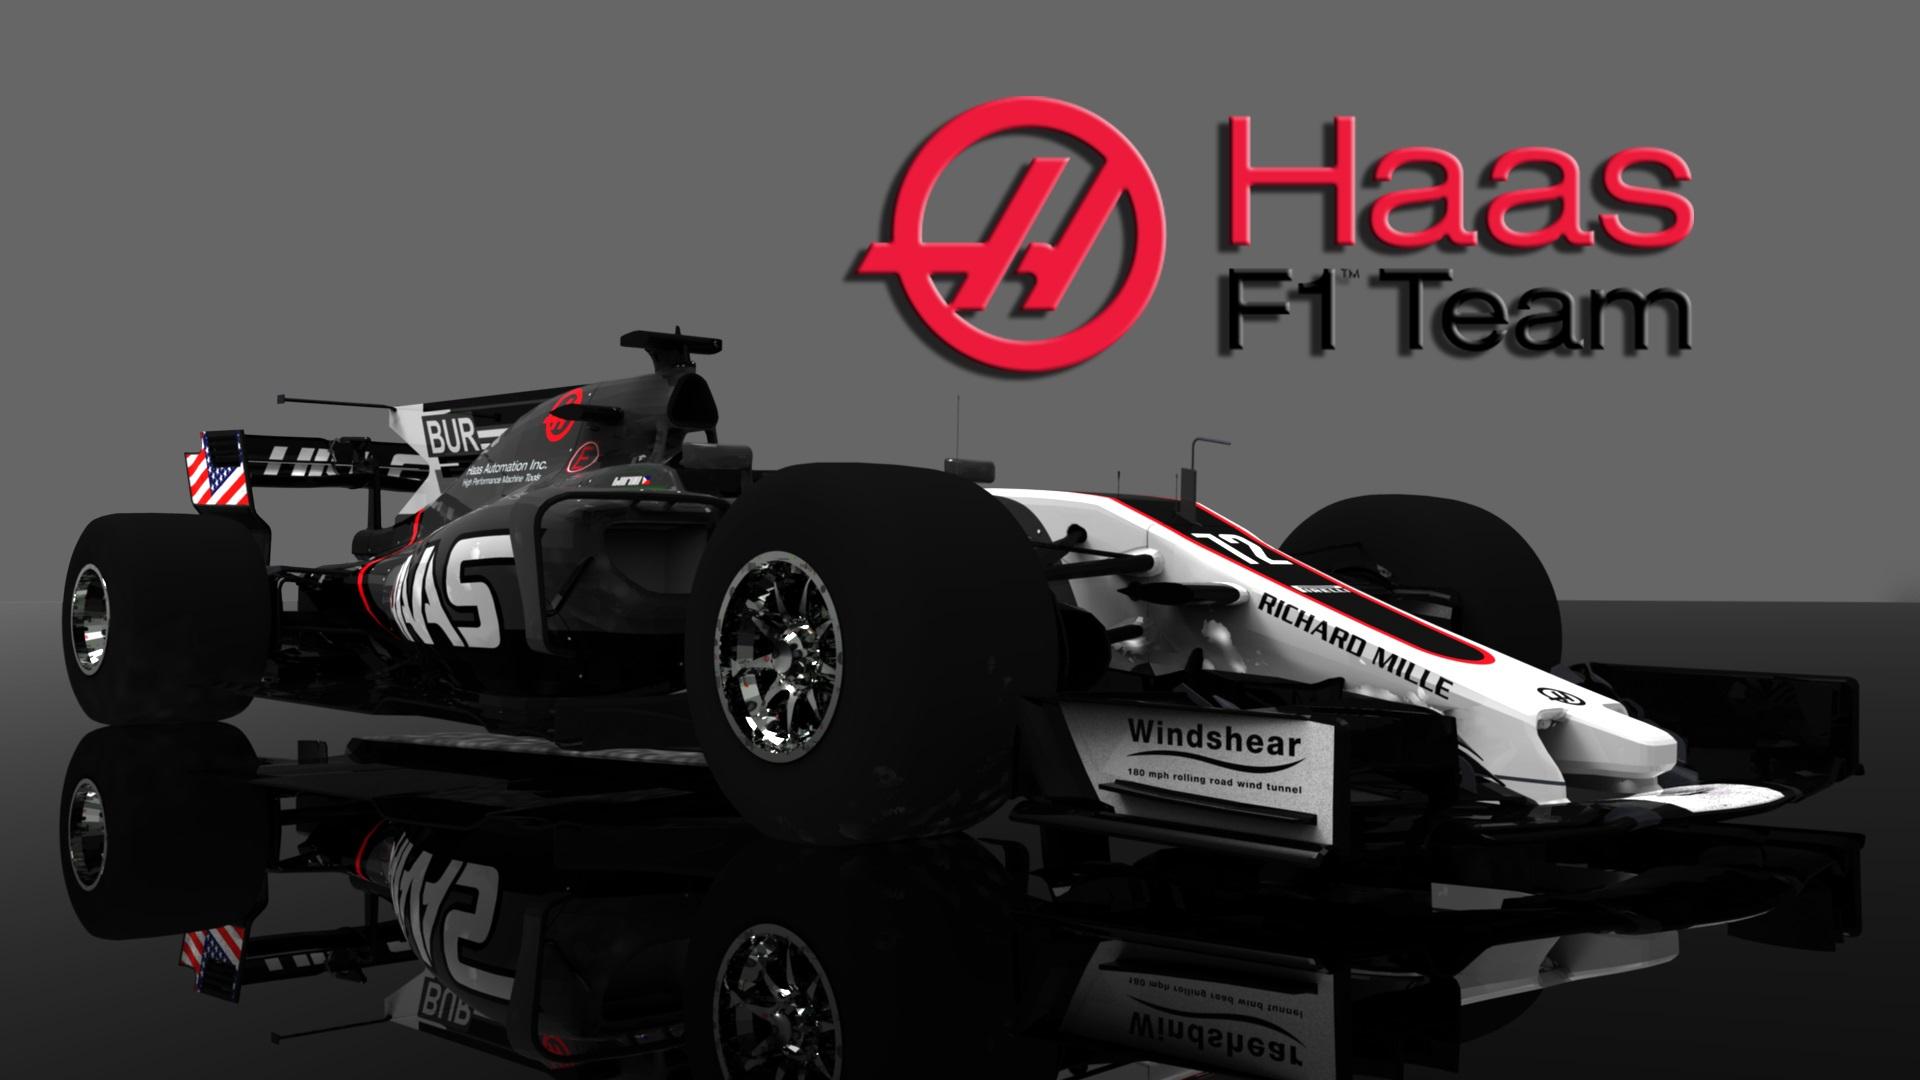 Haas F1 lower.jpg